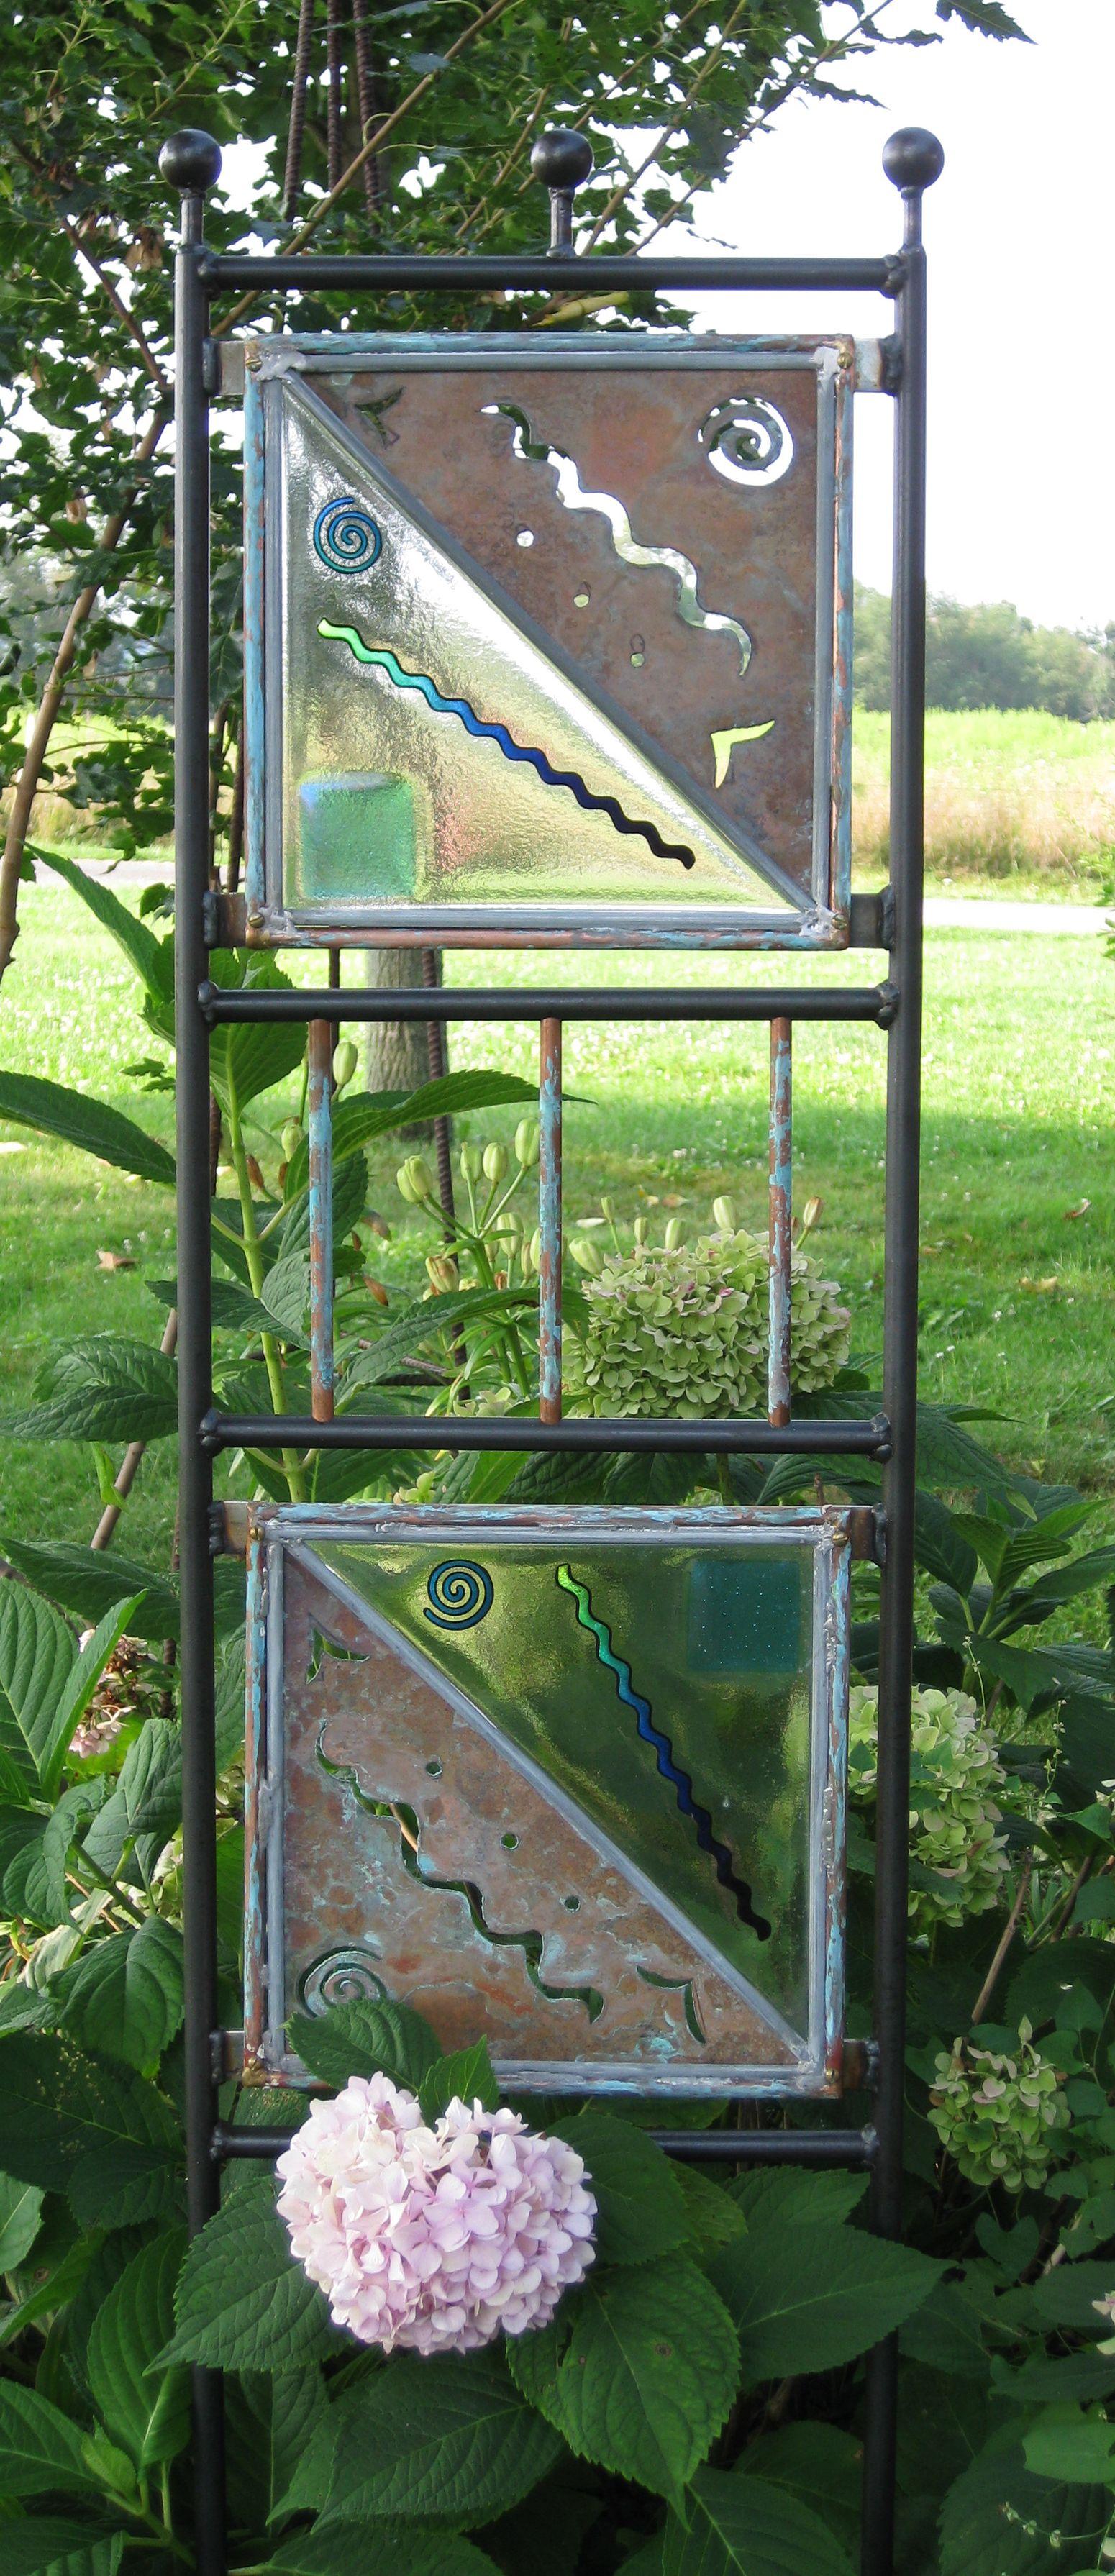 Garden decor trellis  My recycled copper u fused garden trellis It was a